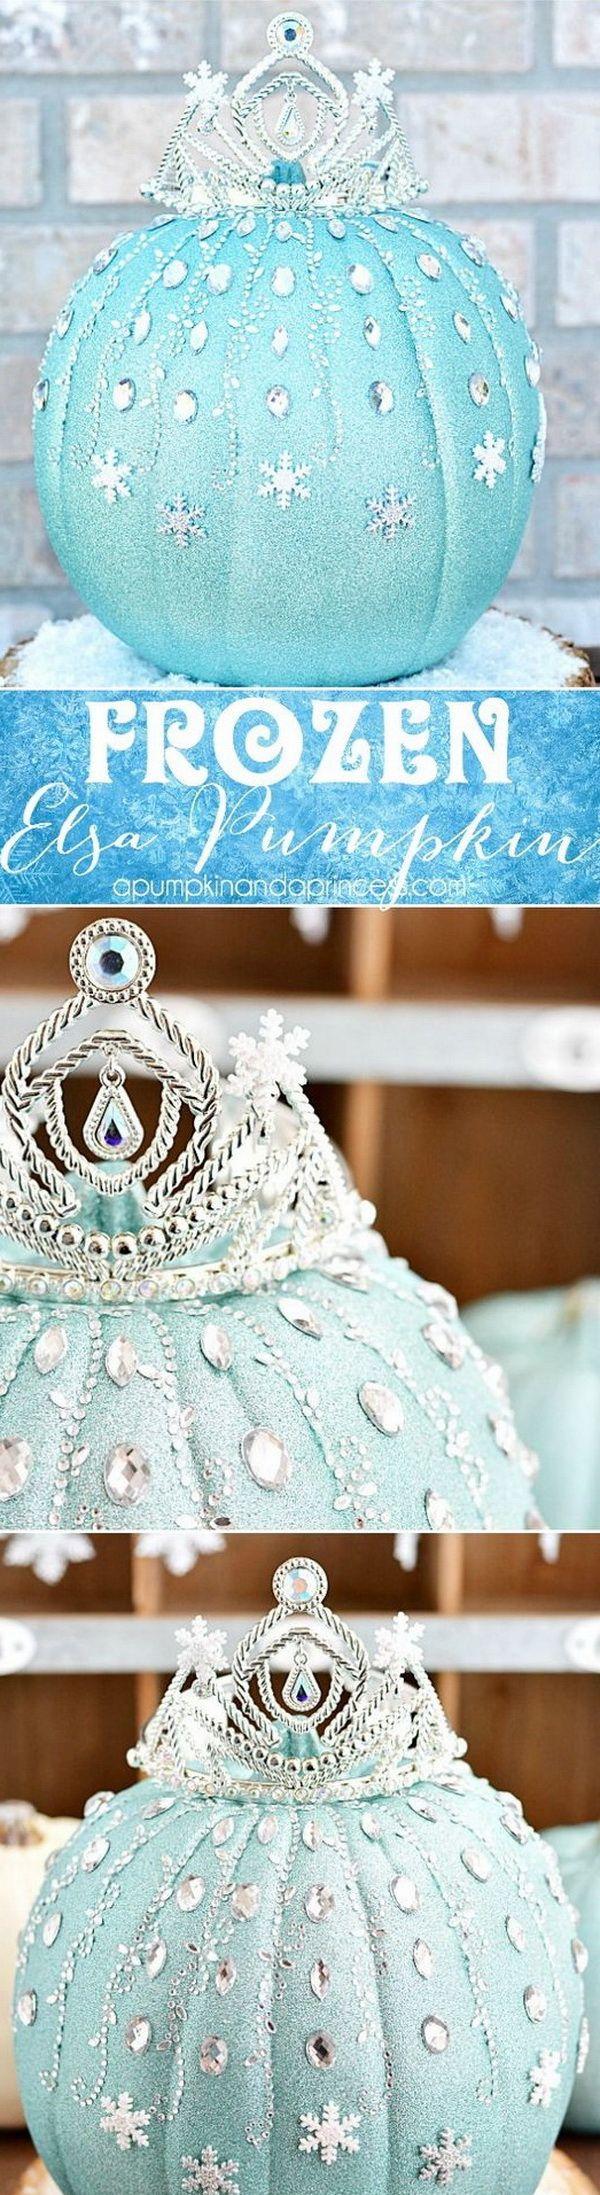 Frozen Elsa Pumpkin.